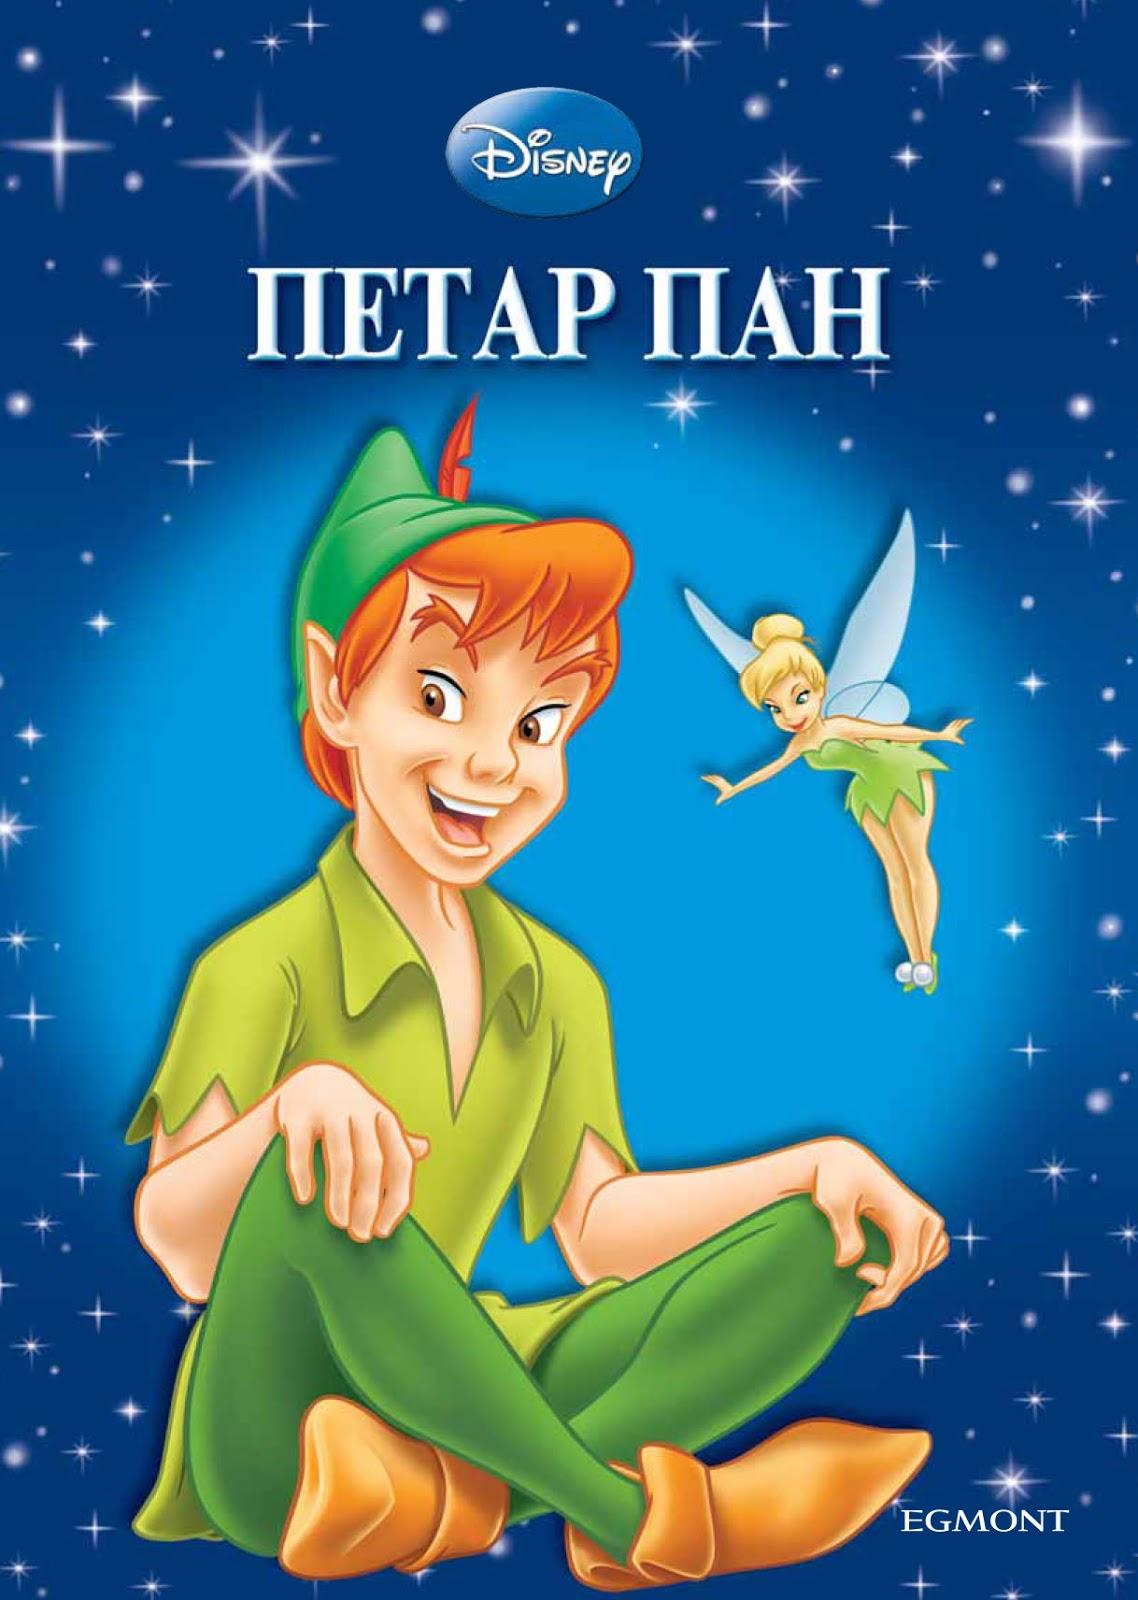 Crtani filmovi, dugometražni 7_Petar+Pan_30.11.2012.